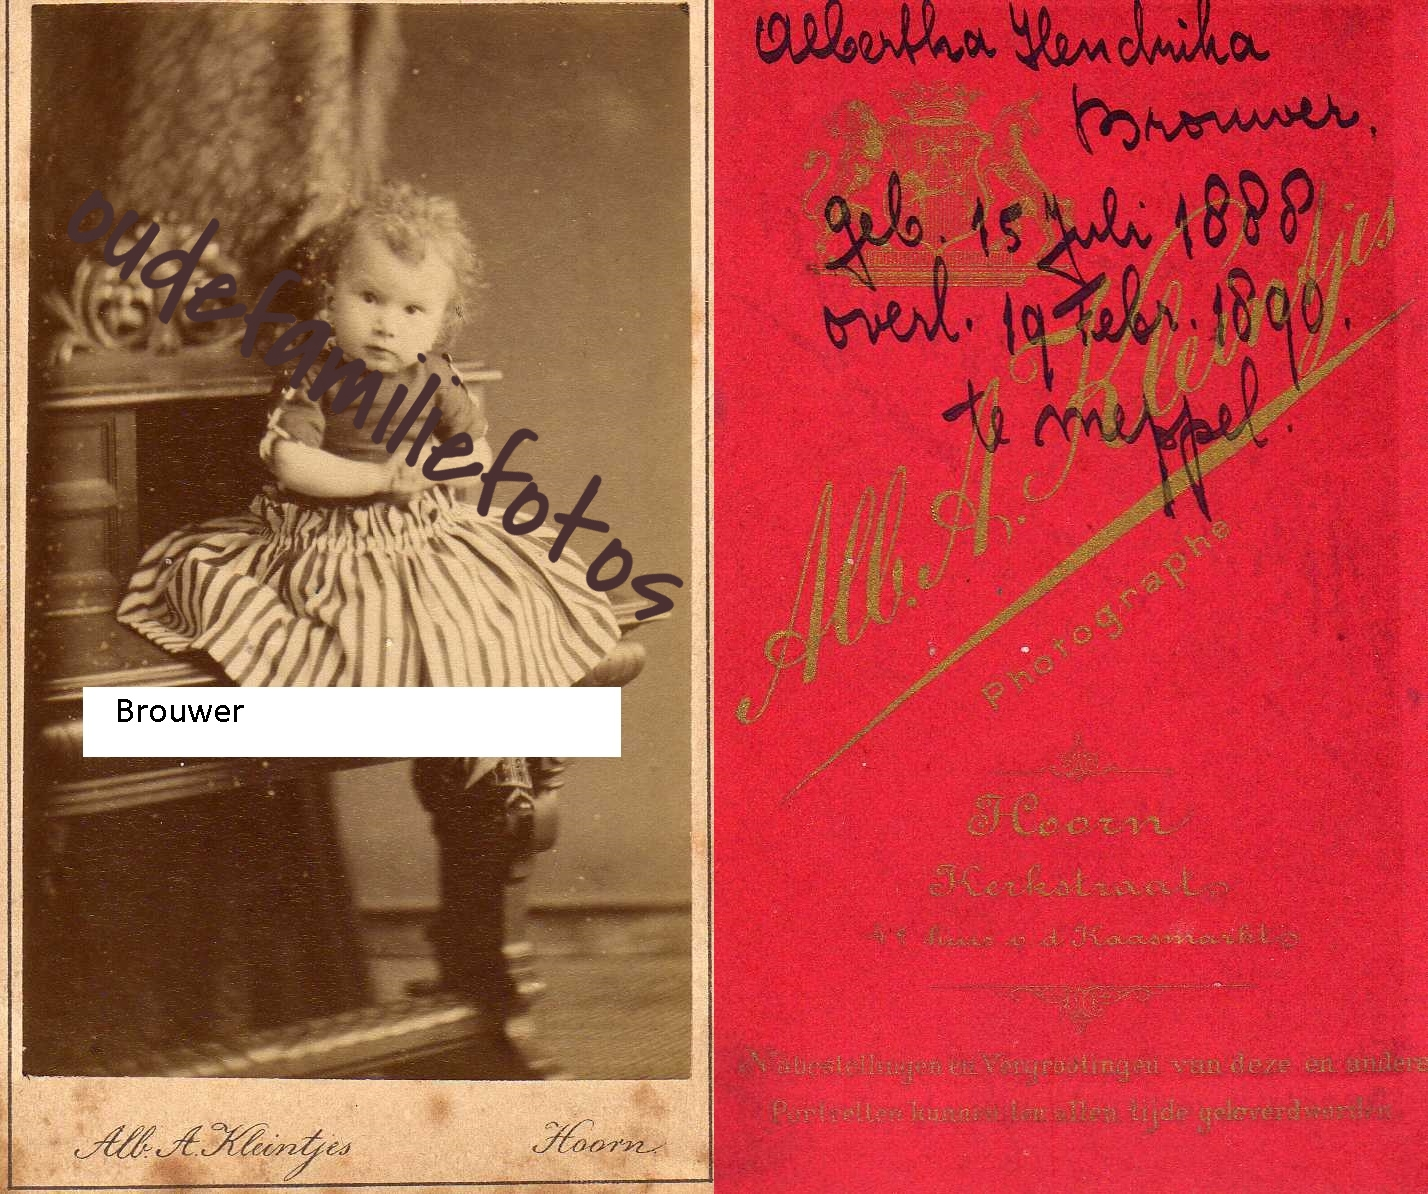 Brouwer, Albertha Hendrika Geb. 15-7-1888 ovl. 19-2-1890 Meppel. Ouders: Gerhardus en Rensje Wildeboer. € 3,00